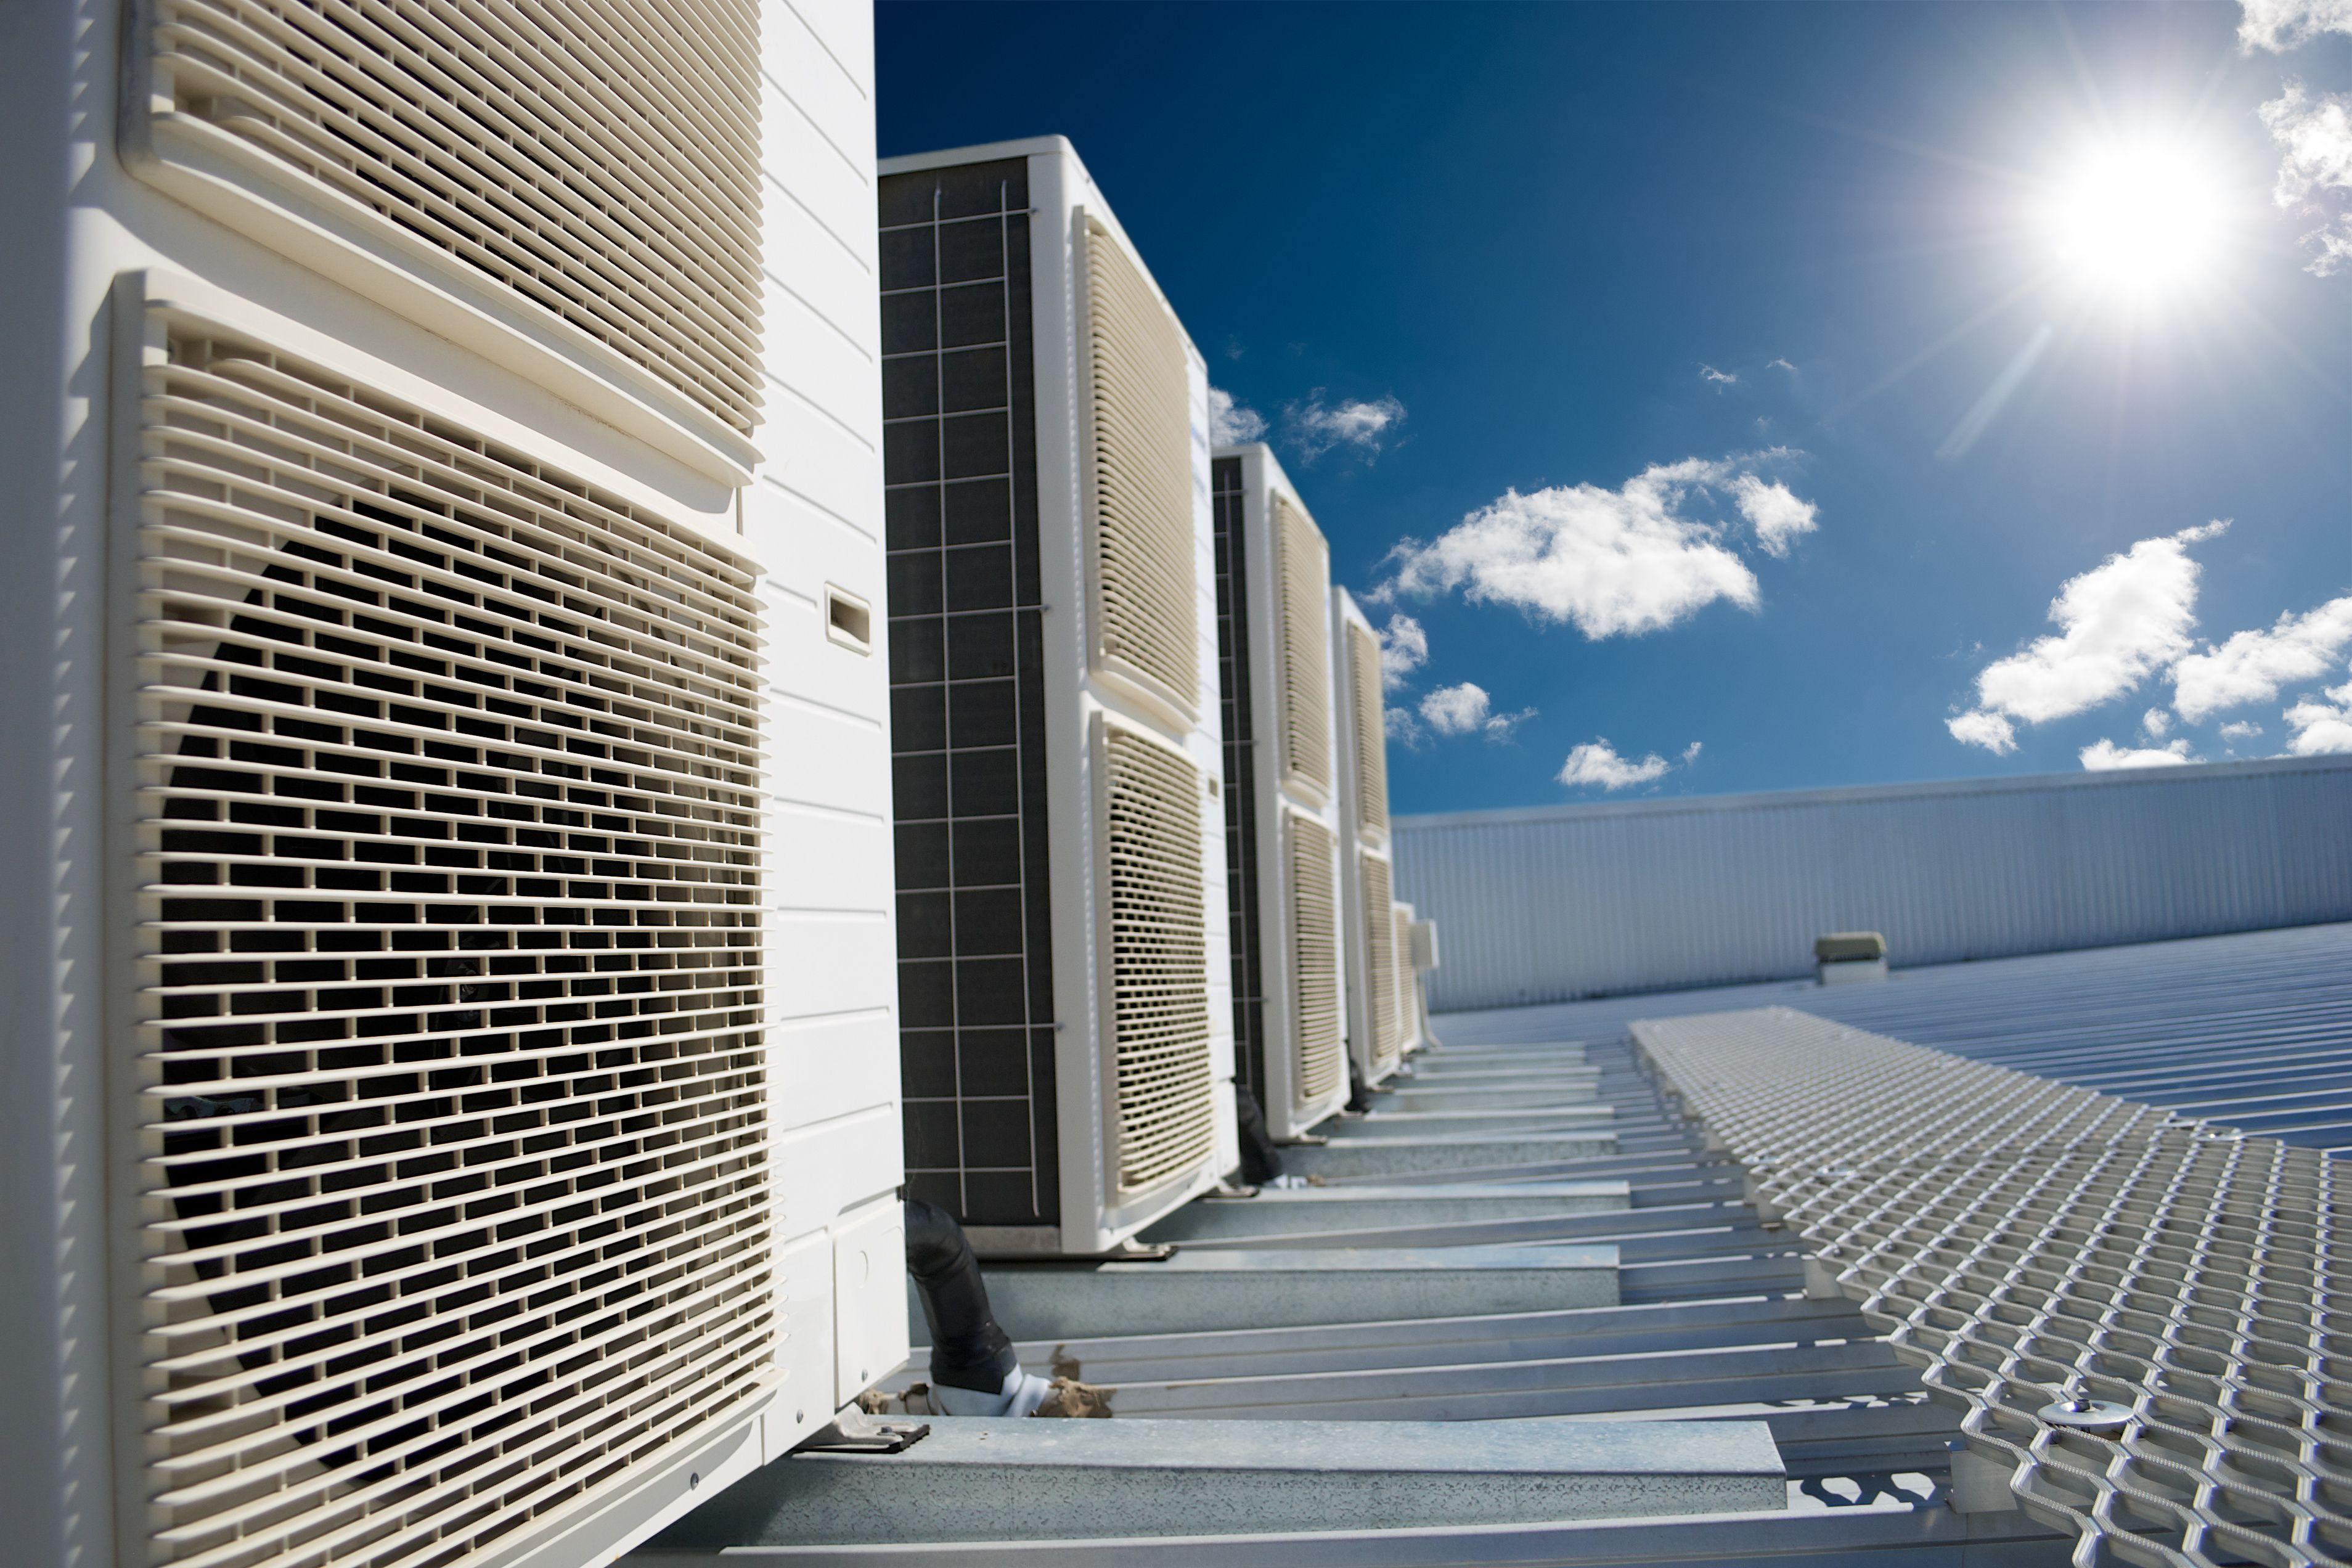 Air Conditioning Repairs Hvac Air Conditioning Air Conditioning